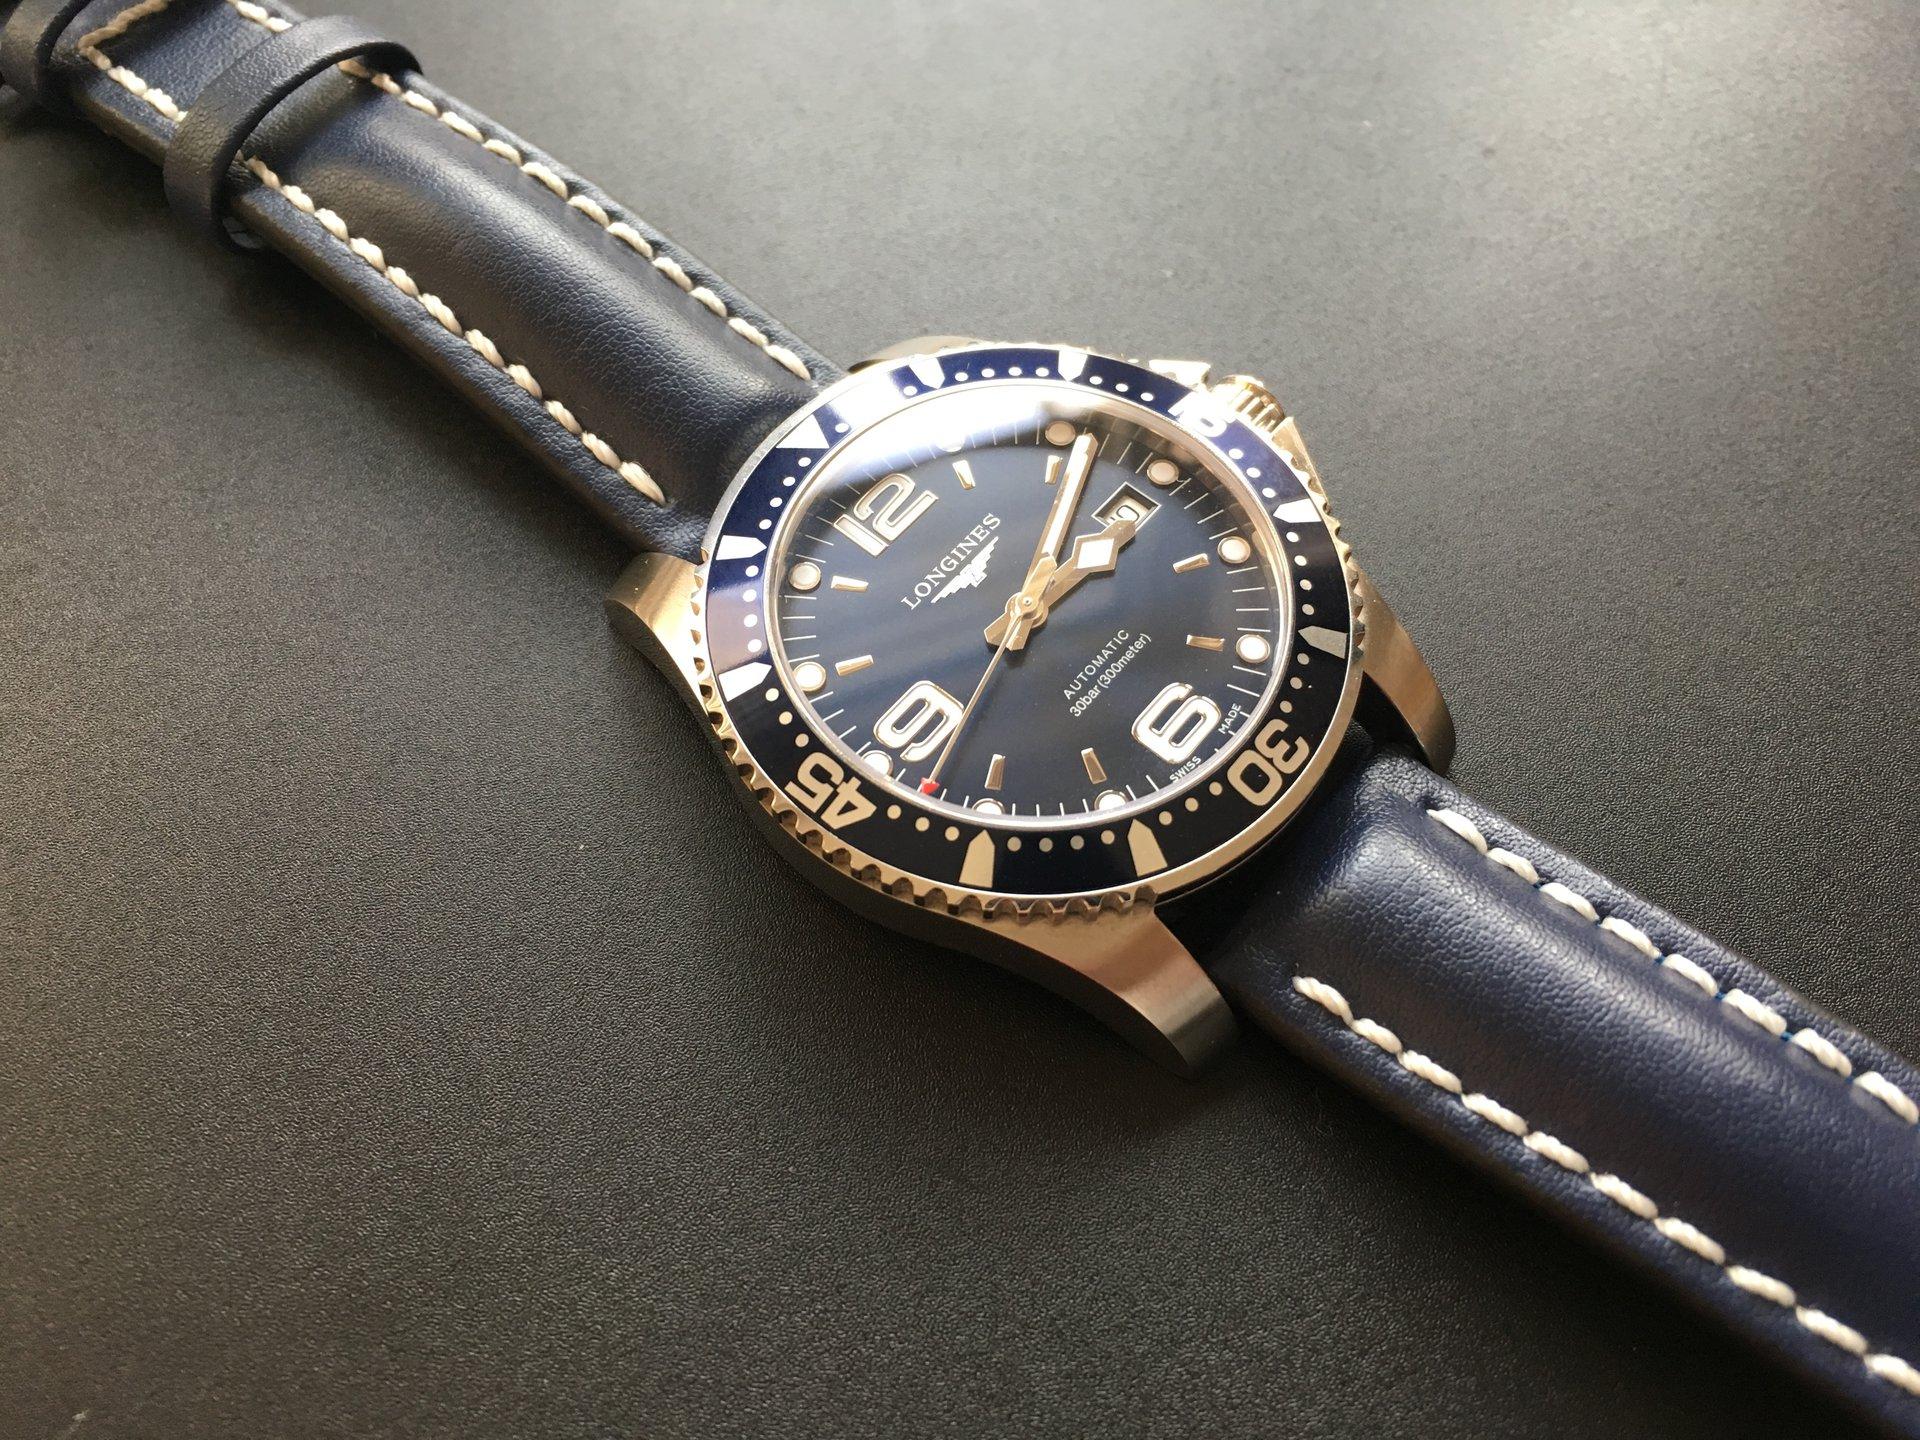 Longines Hydroconquest Automatic >> Longines Hydroconquest / Automatic / Blau - Hirsch Armband - UhrForum